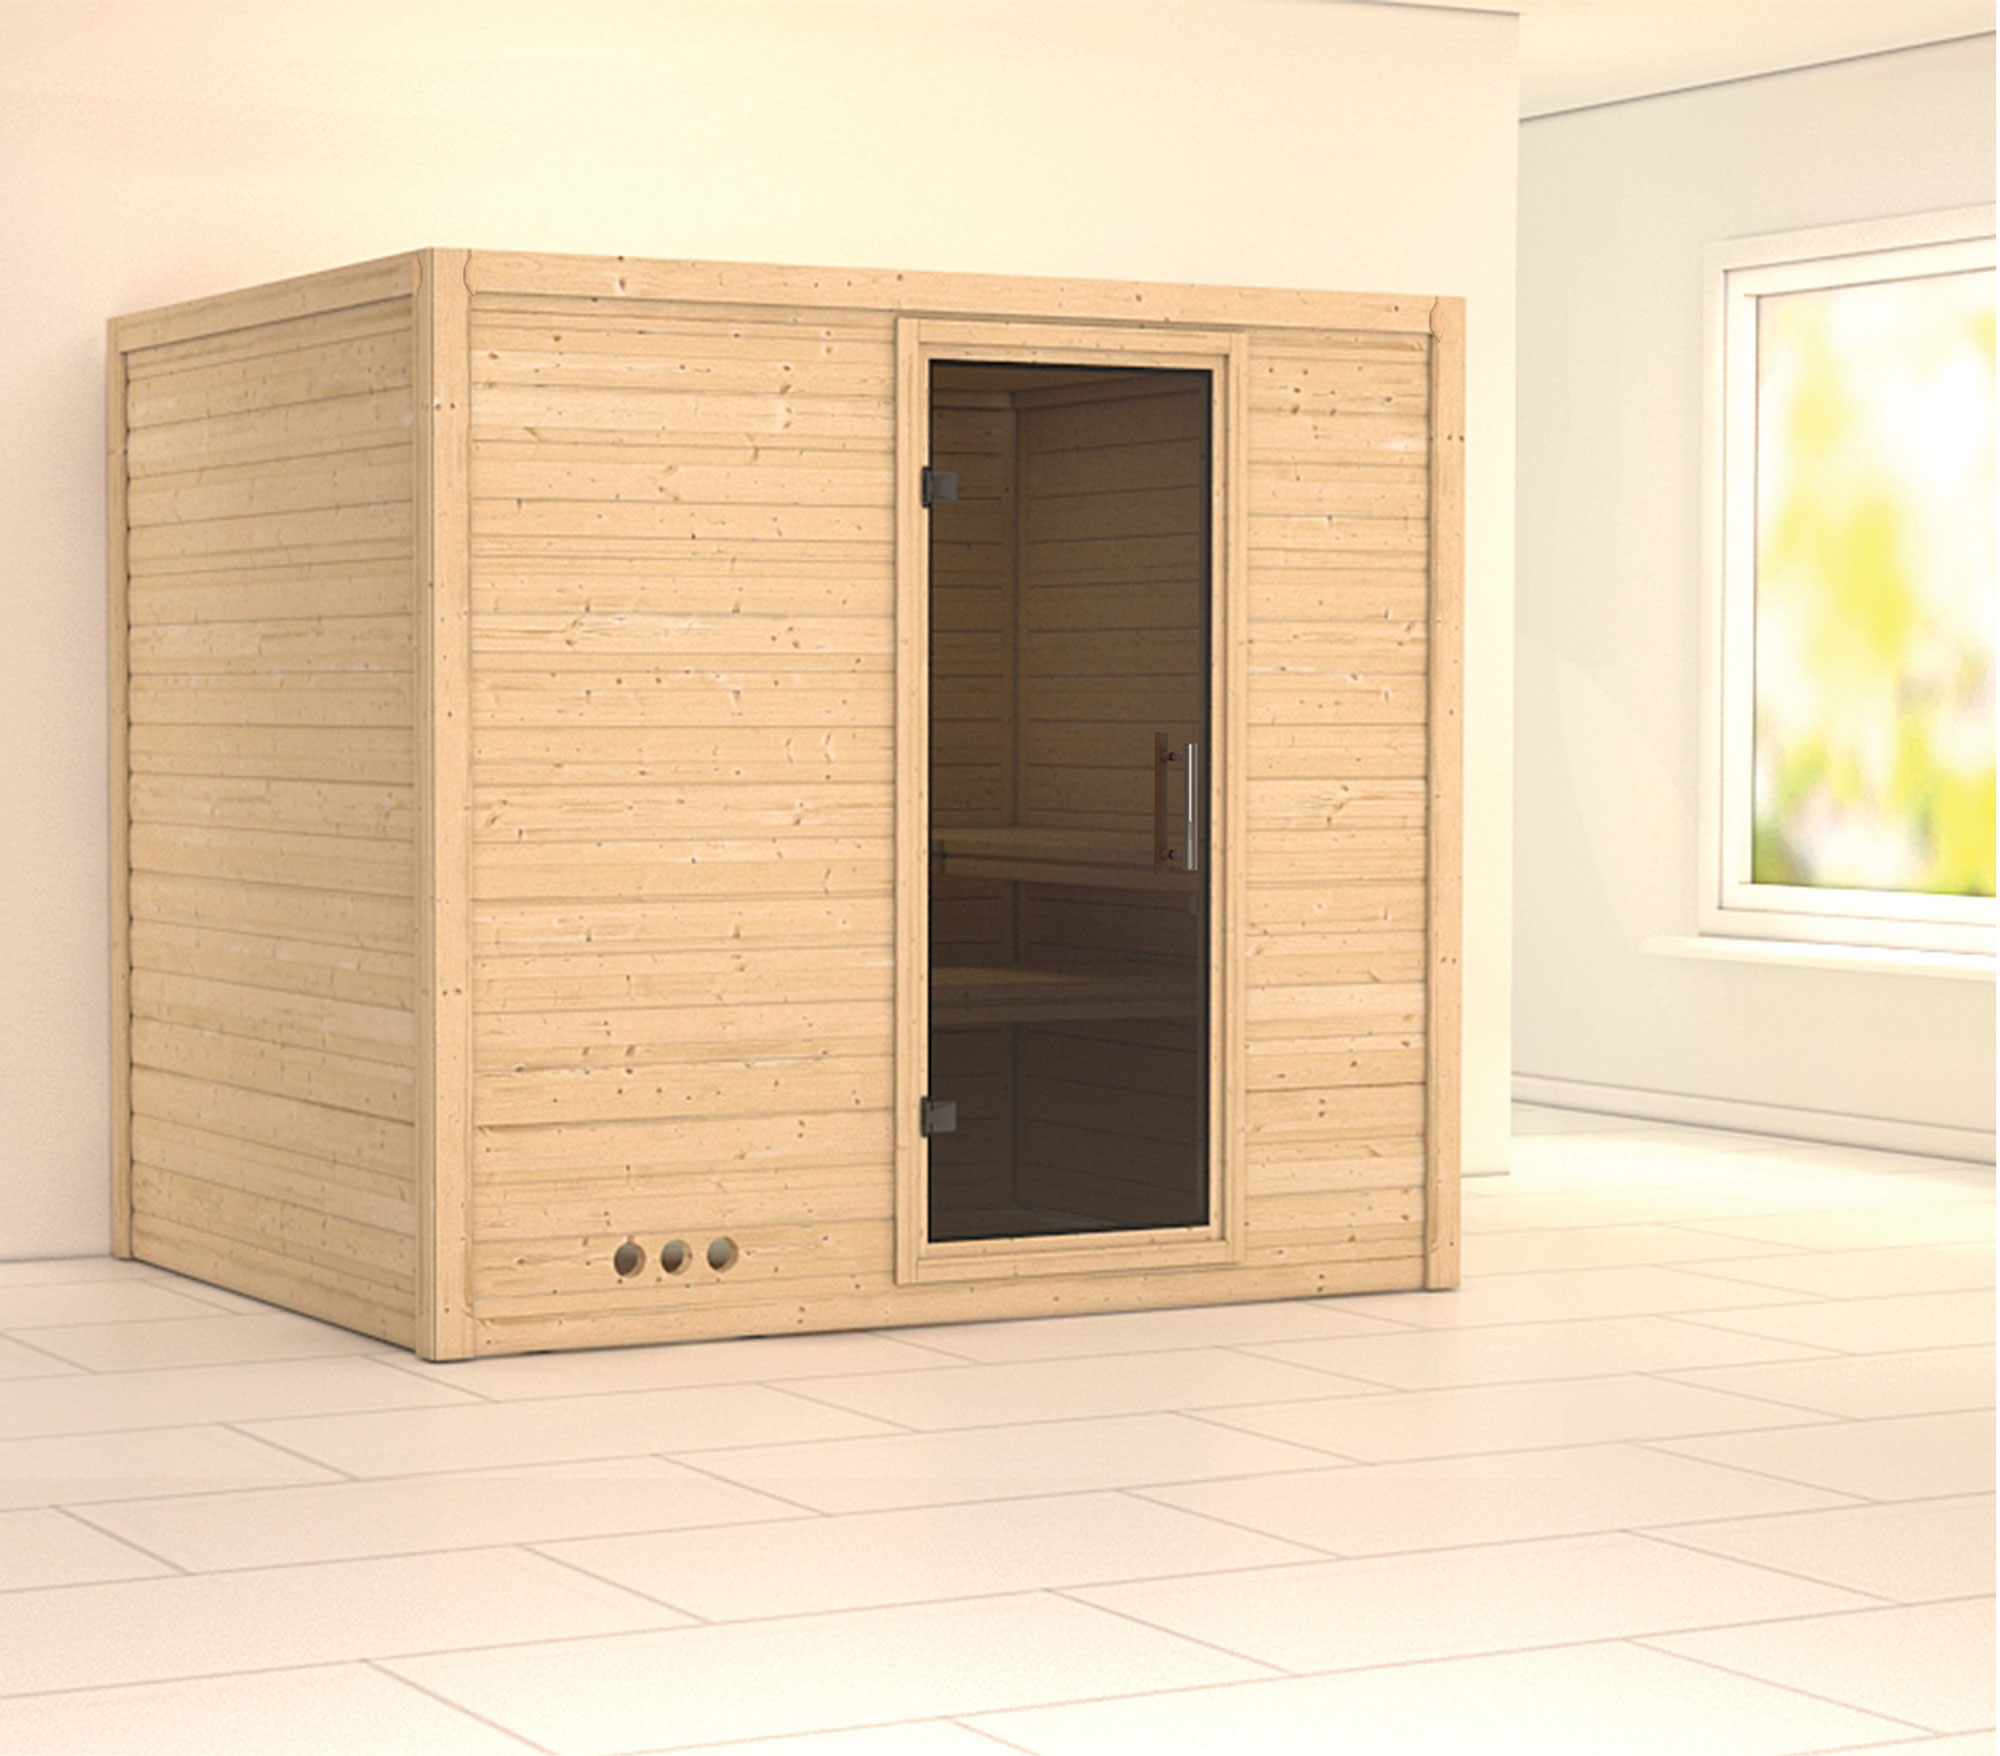 Karibu Sauna Sonara 40mm ohne Ofen moderne Tür Bild 1